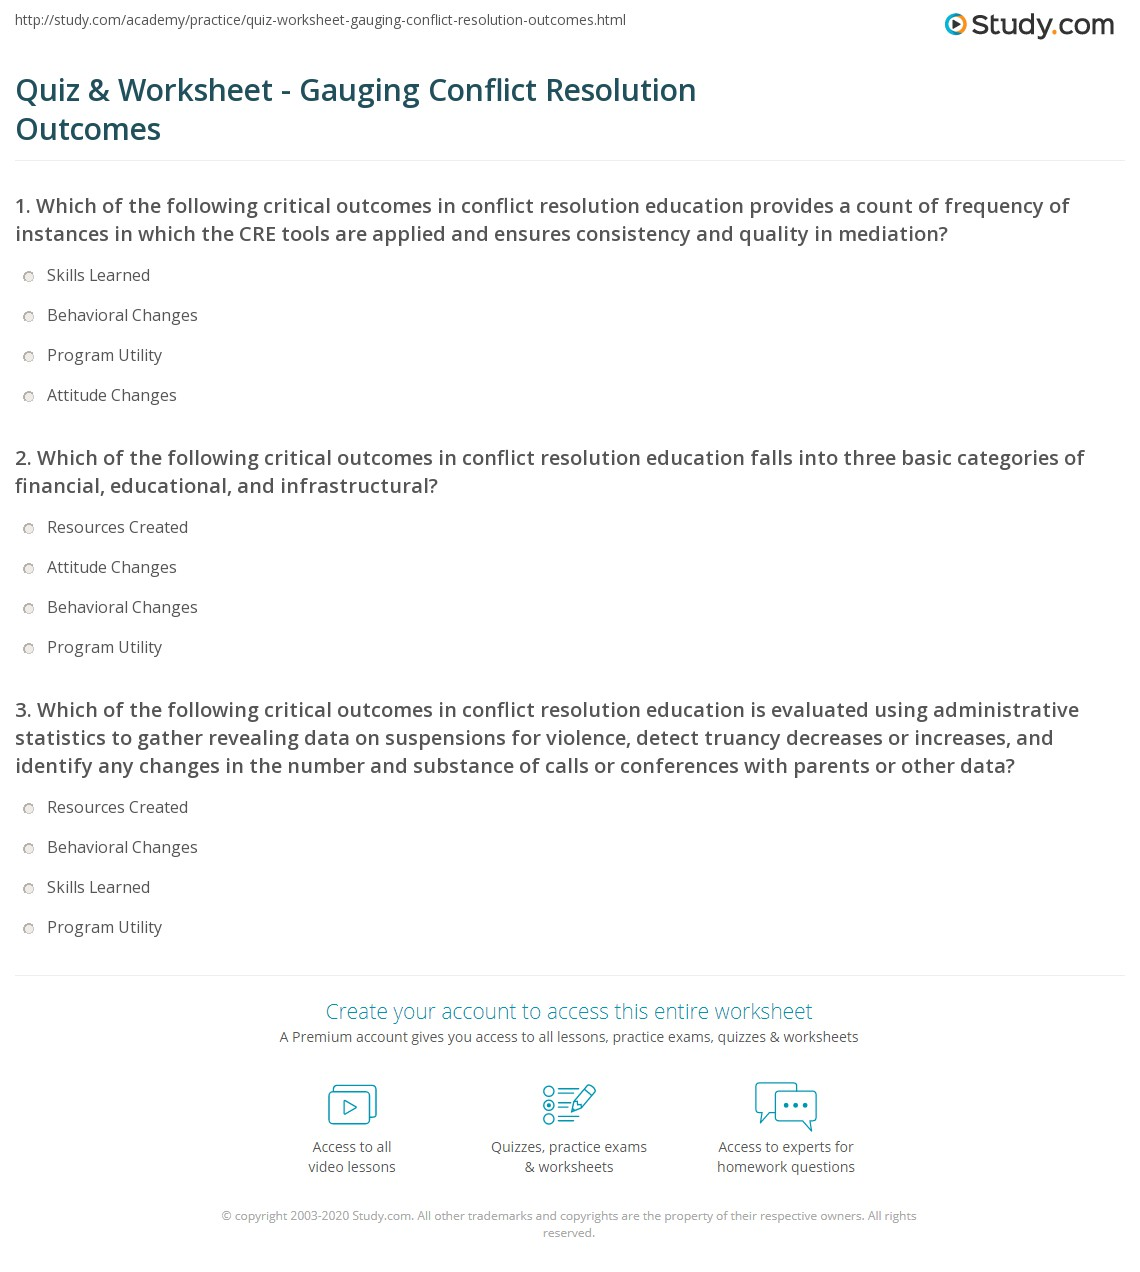 Quiz & Worksheet Gauging Conflict Resolution Out es